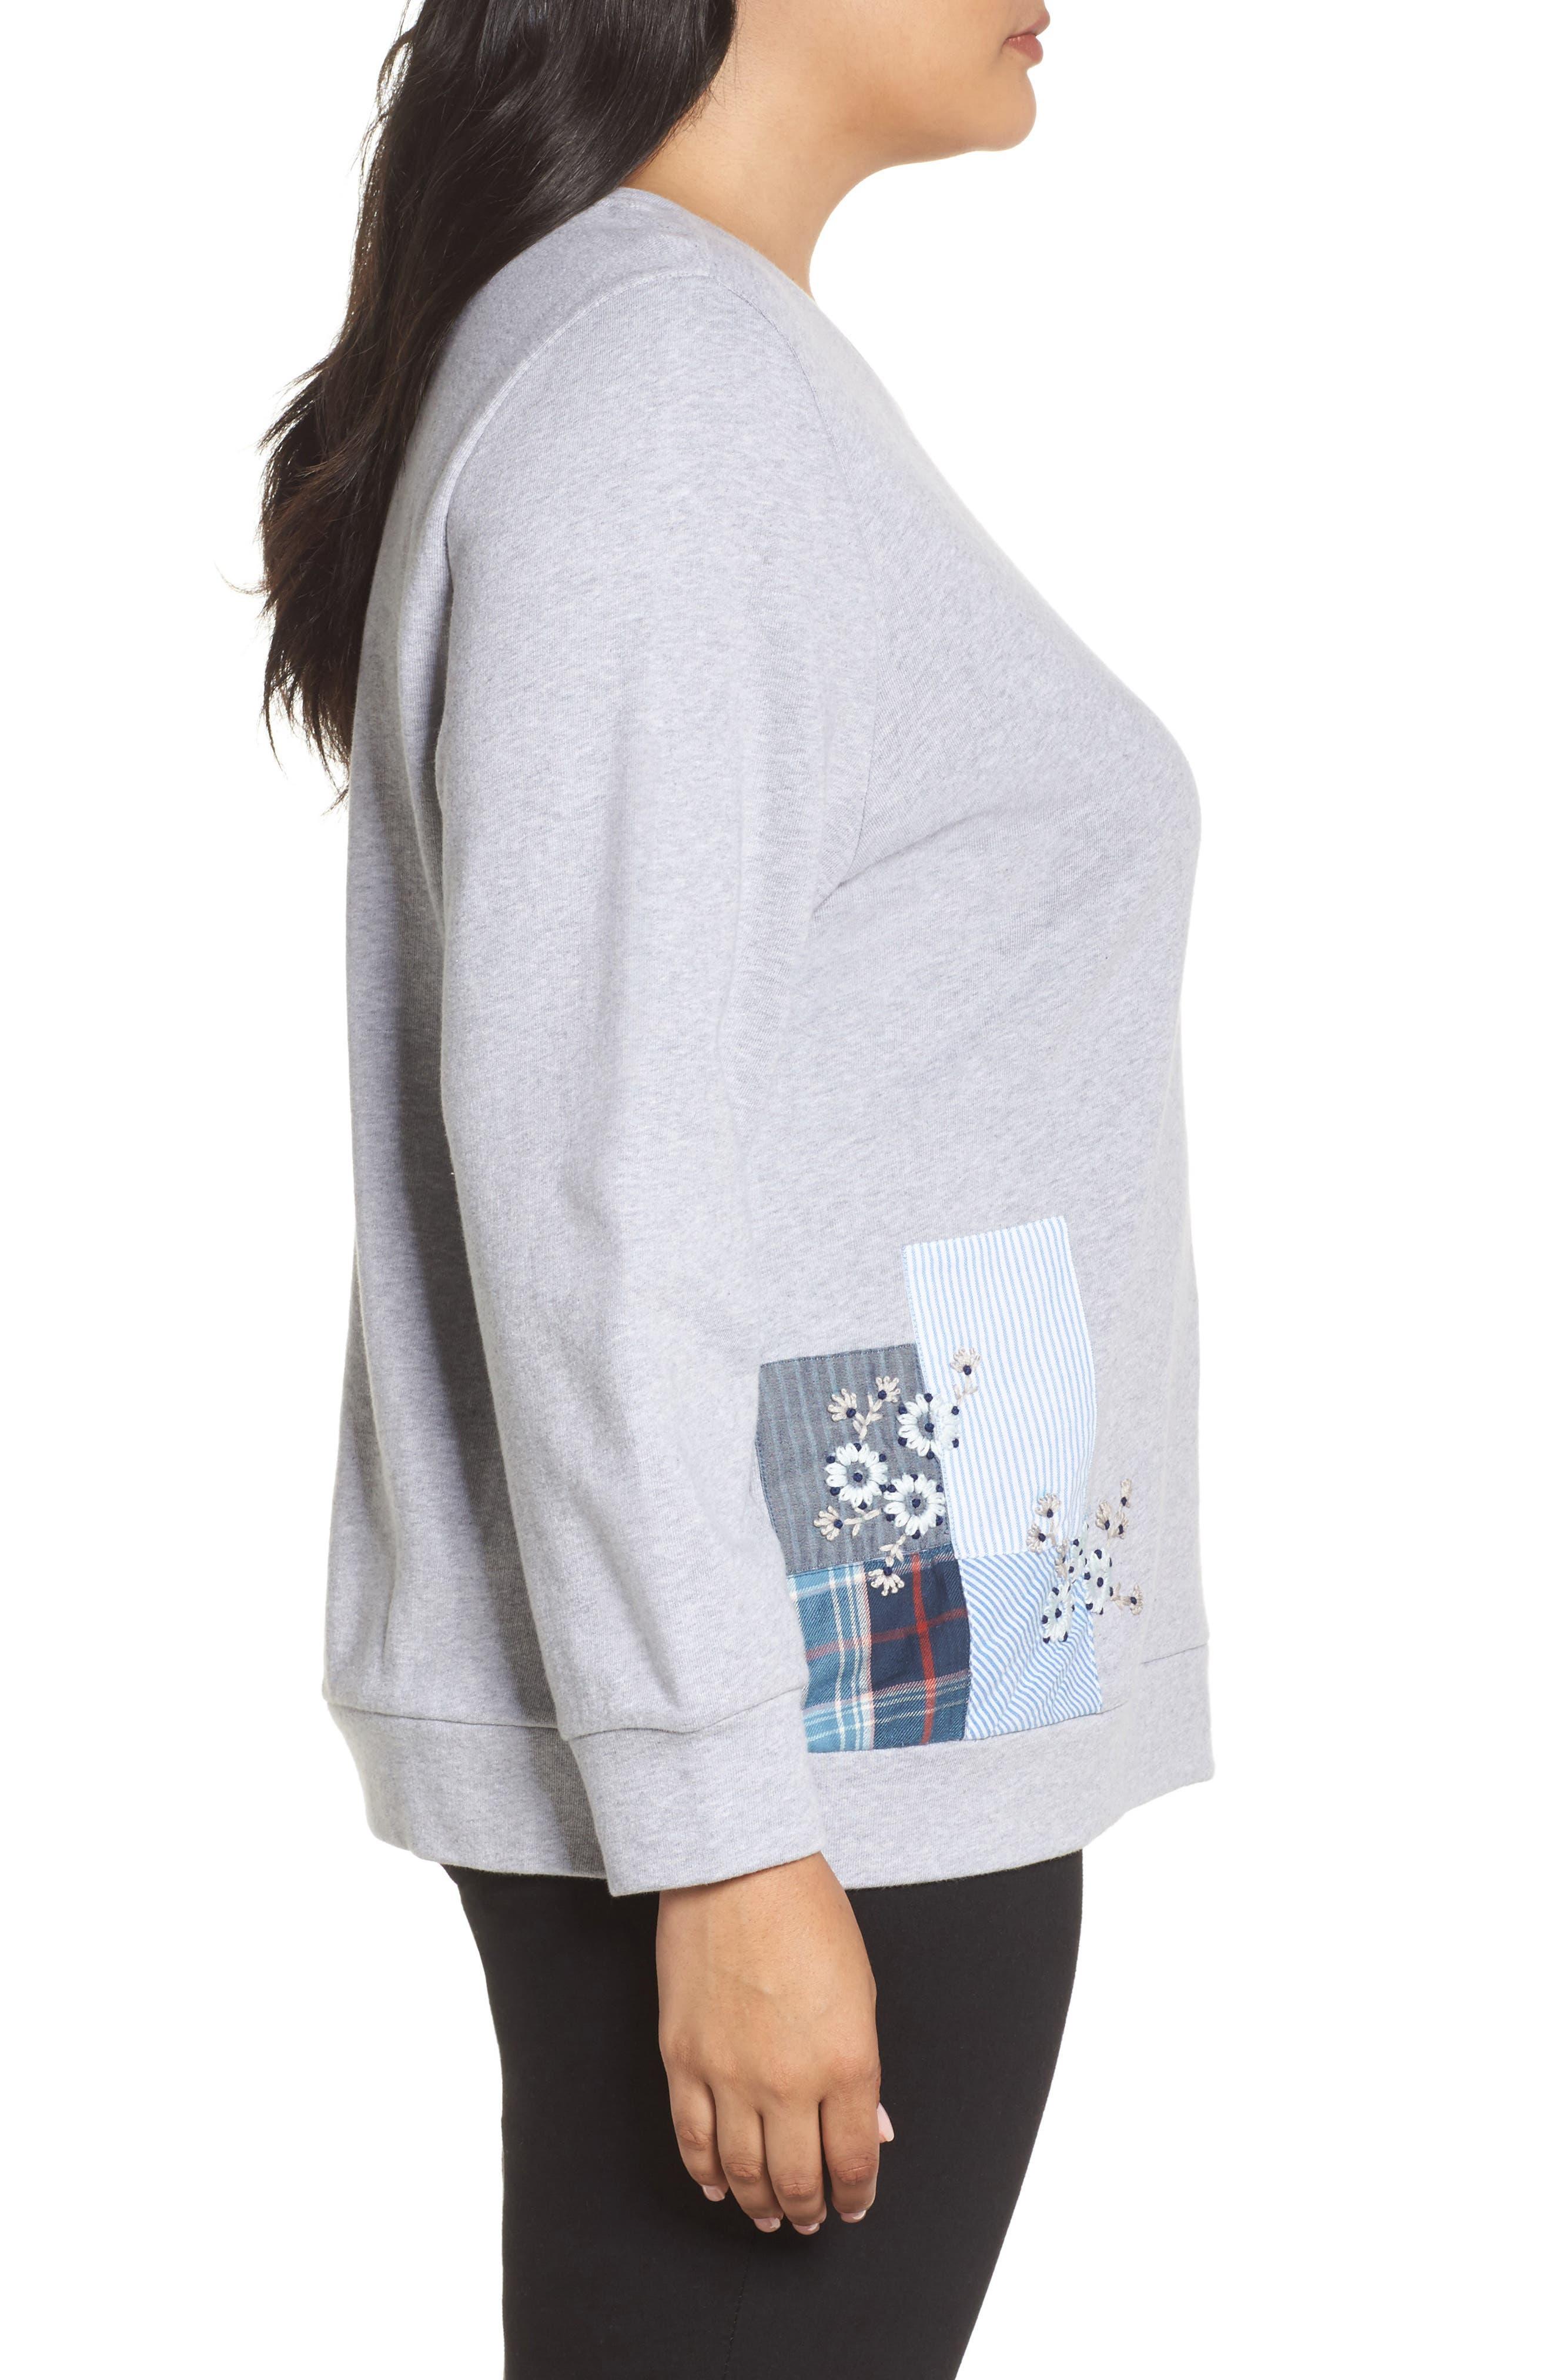 Patchwork Sweatshirt,                             Alternate thumbnail 3, color,                             Grey Floral